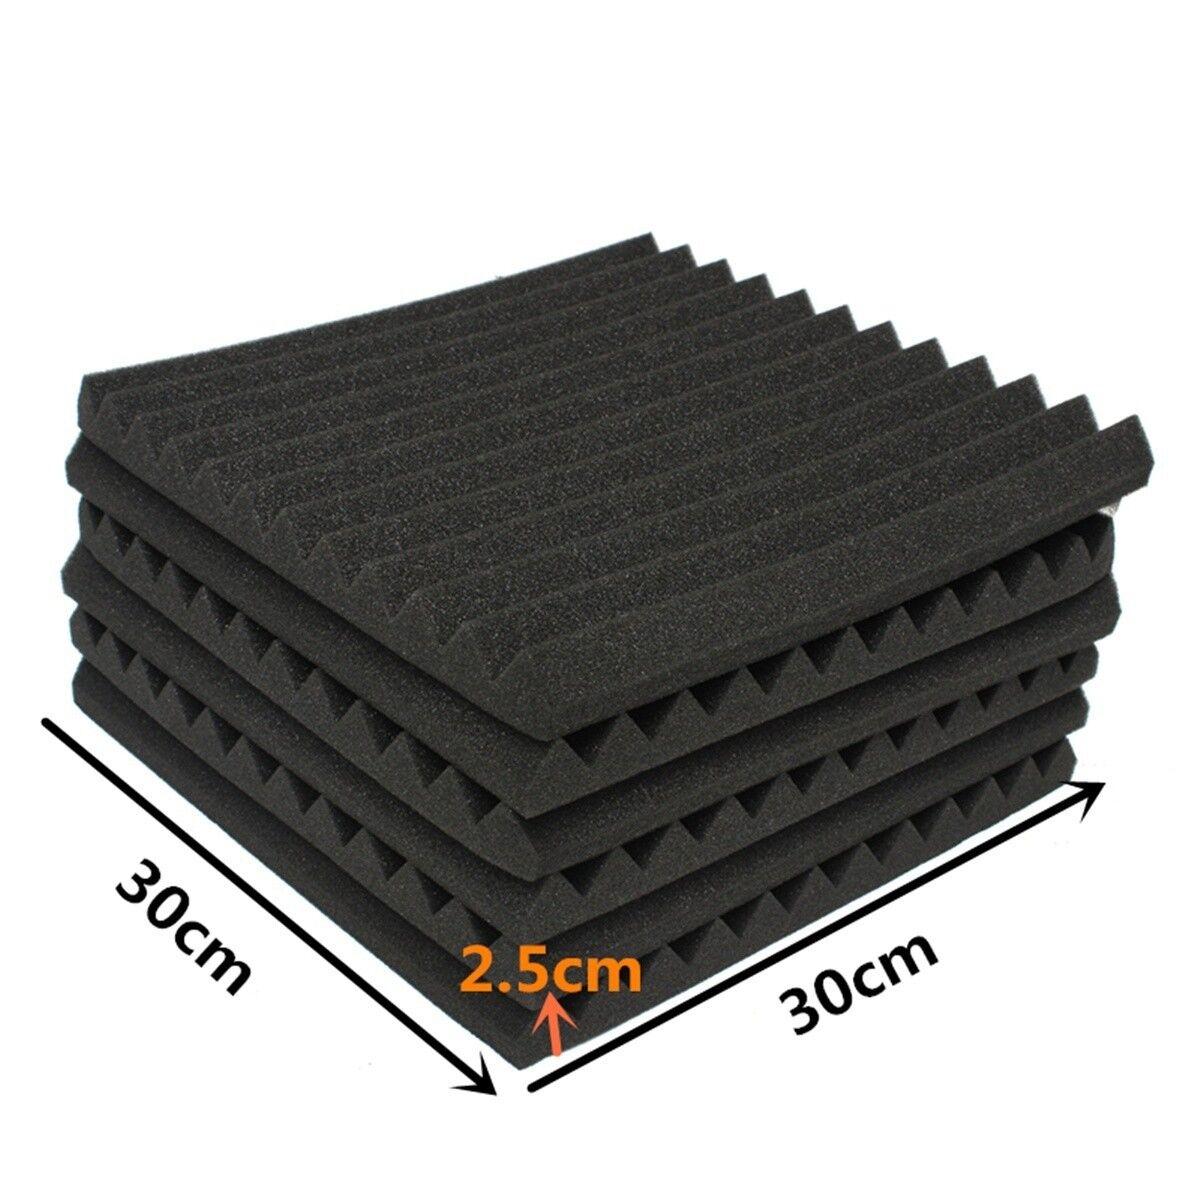 12/24PCs Acoustic Panels Tiles Studio Sound Proofing Insulation Closed Cell Foam 3